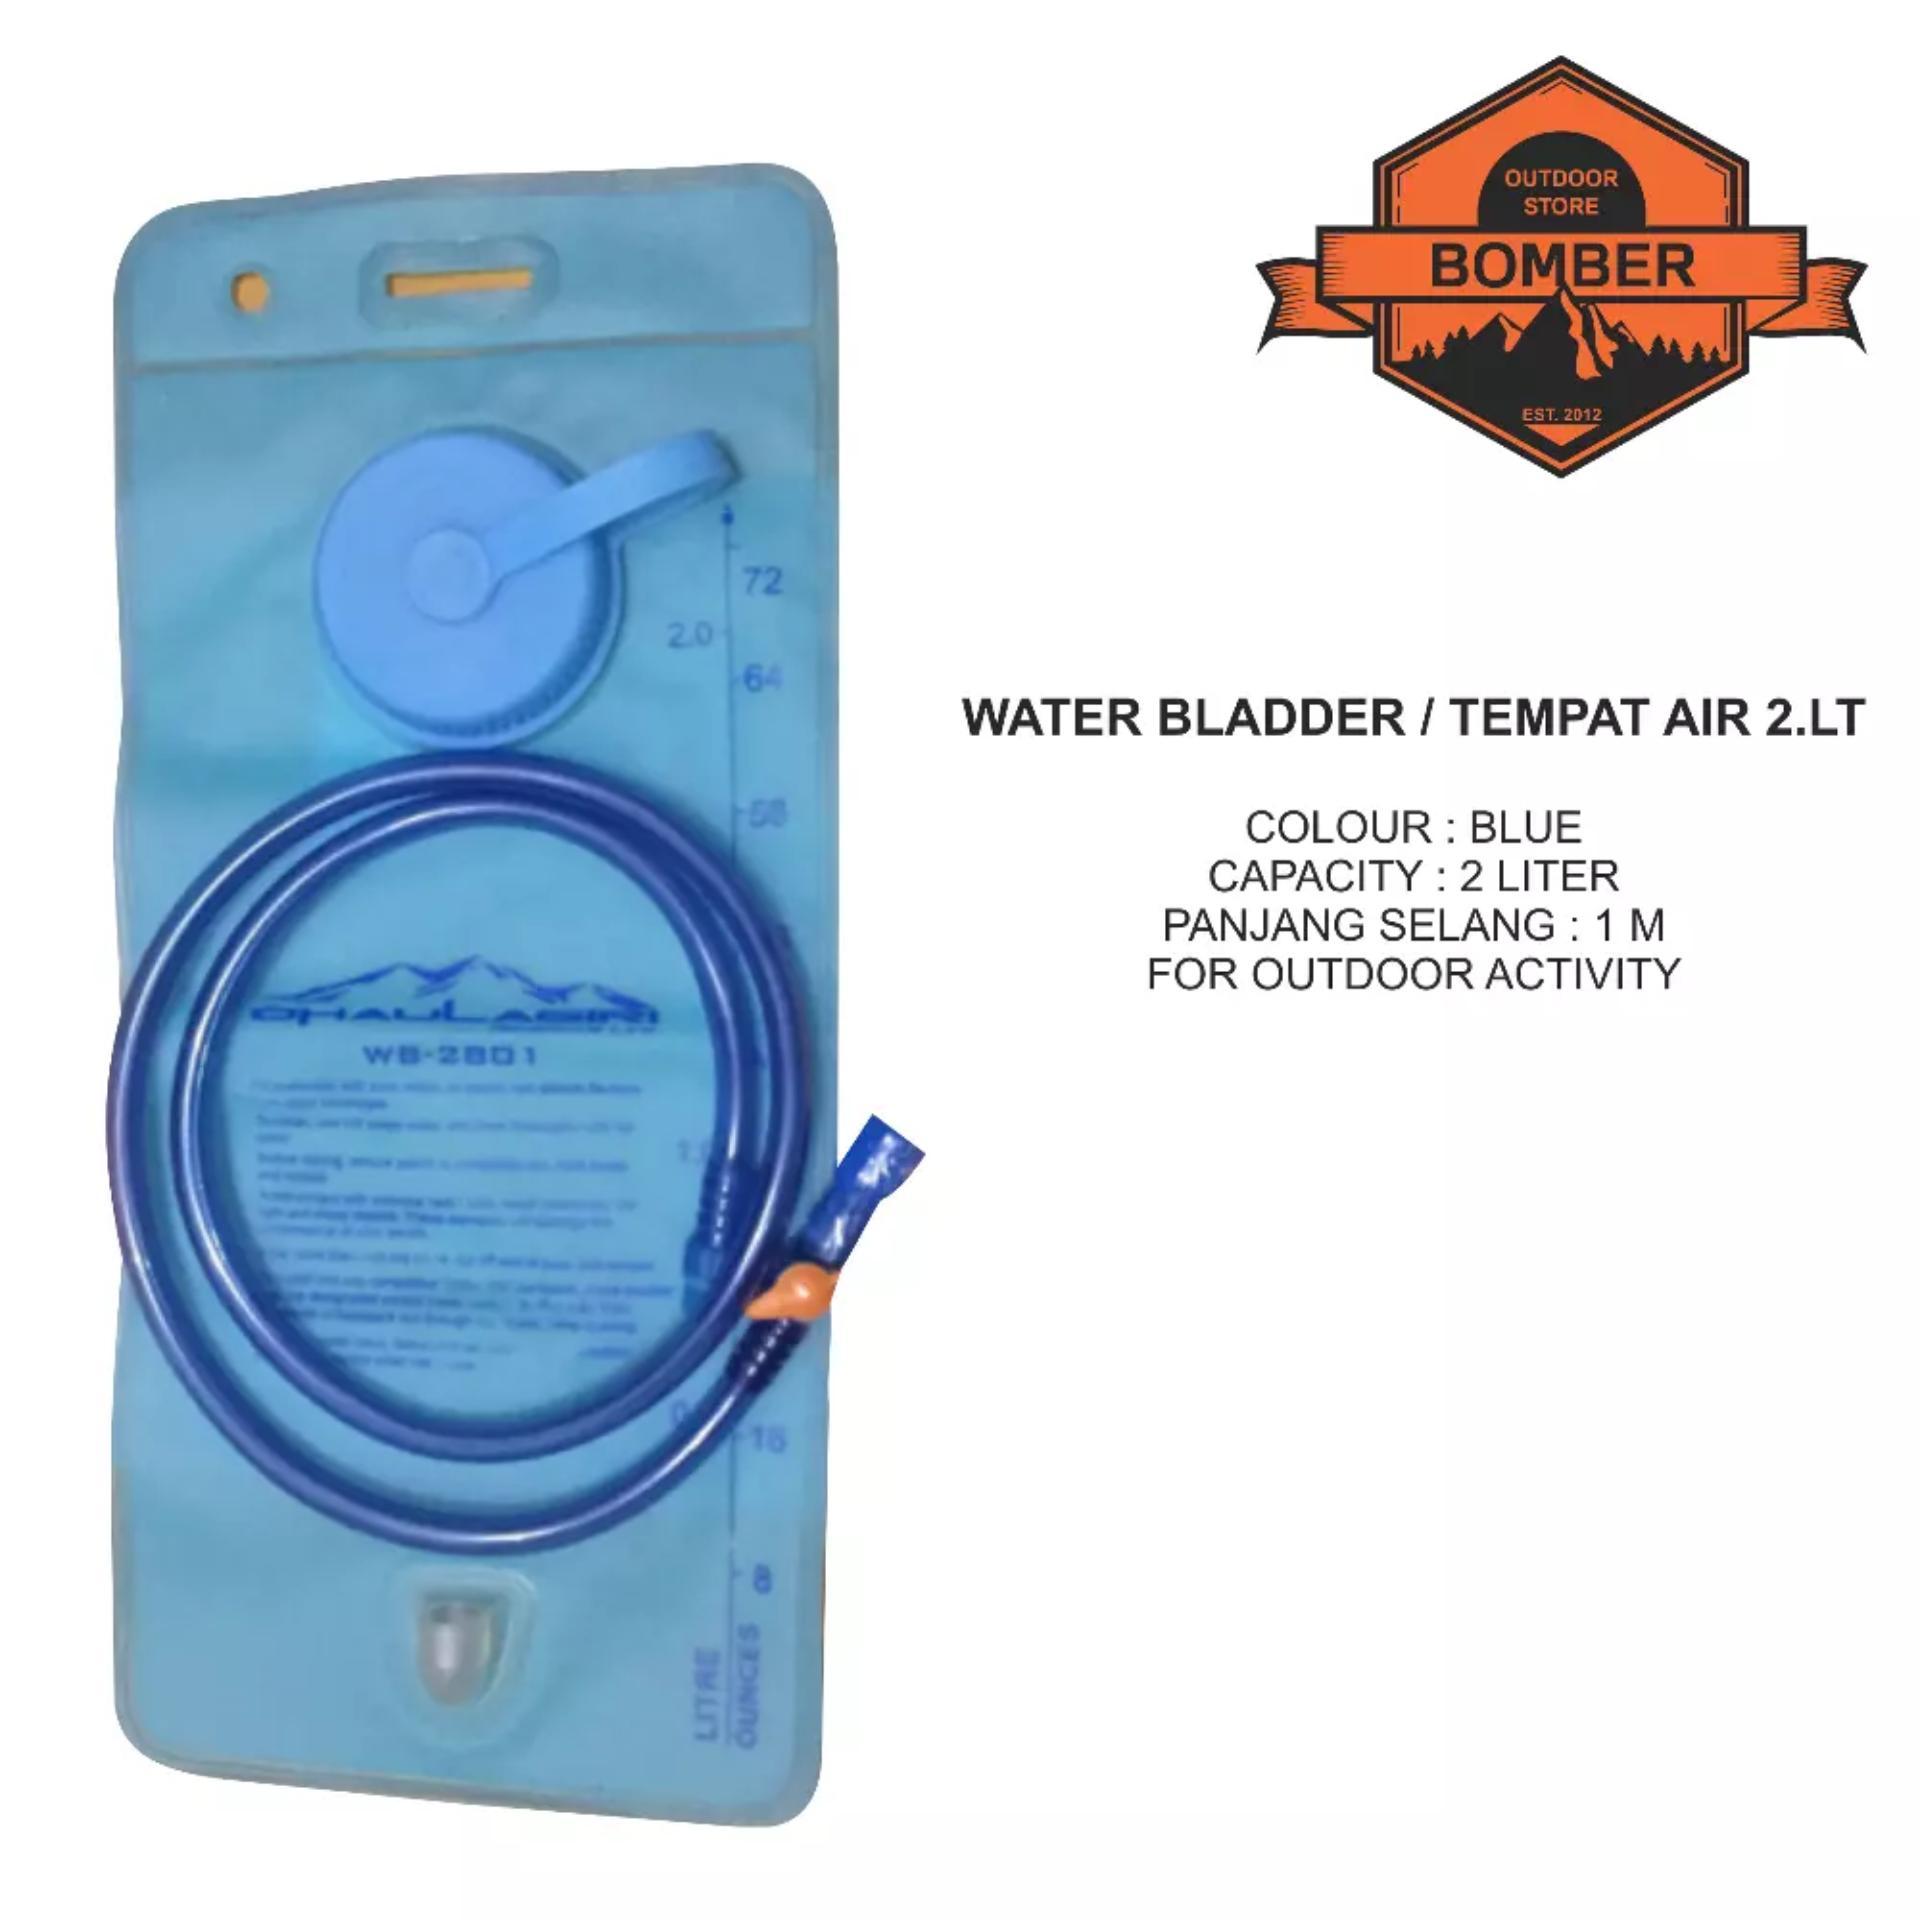 Universal 2l Water Bladder Blader Hydration Bag Tempat Kantong Air Aonijie Sd17 15l Minum Flash Sale U Tas Ransel Hydropack Bersepeda Trail